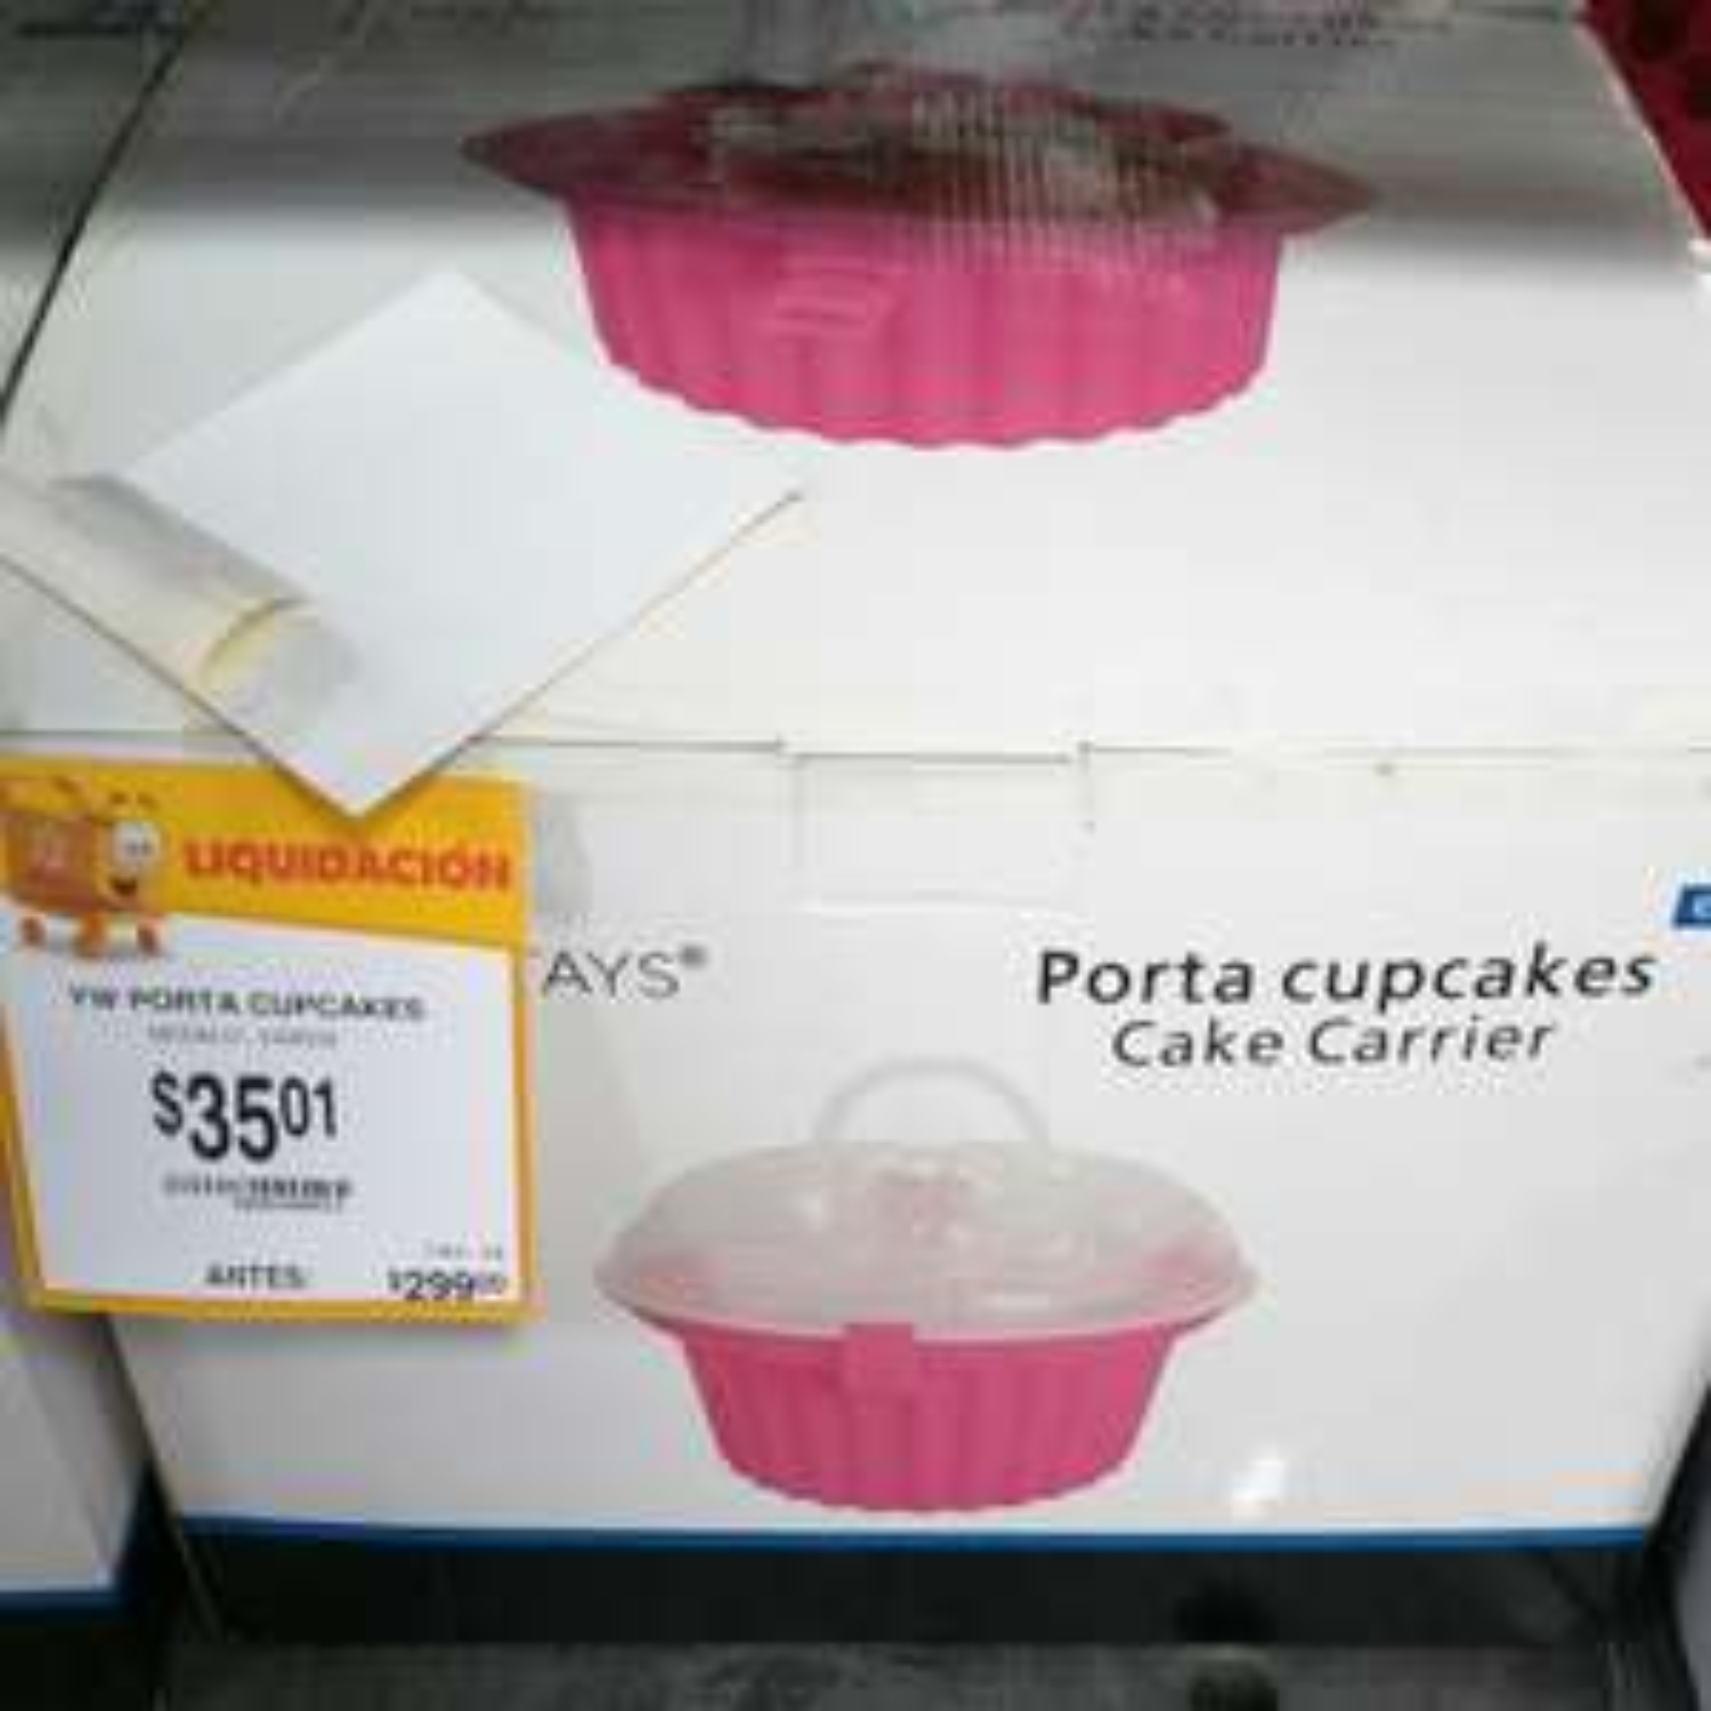 Walmart, León. Liquidación porta 24 cupcakes